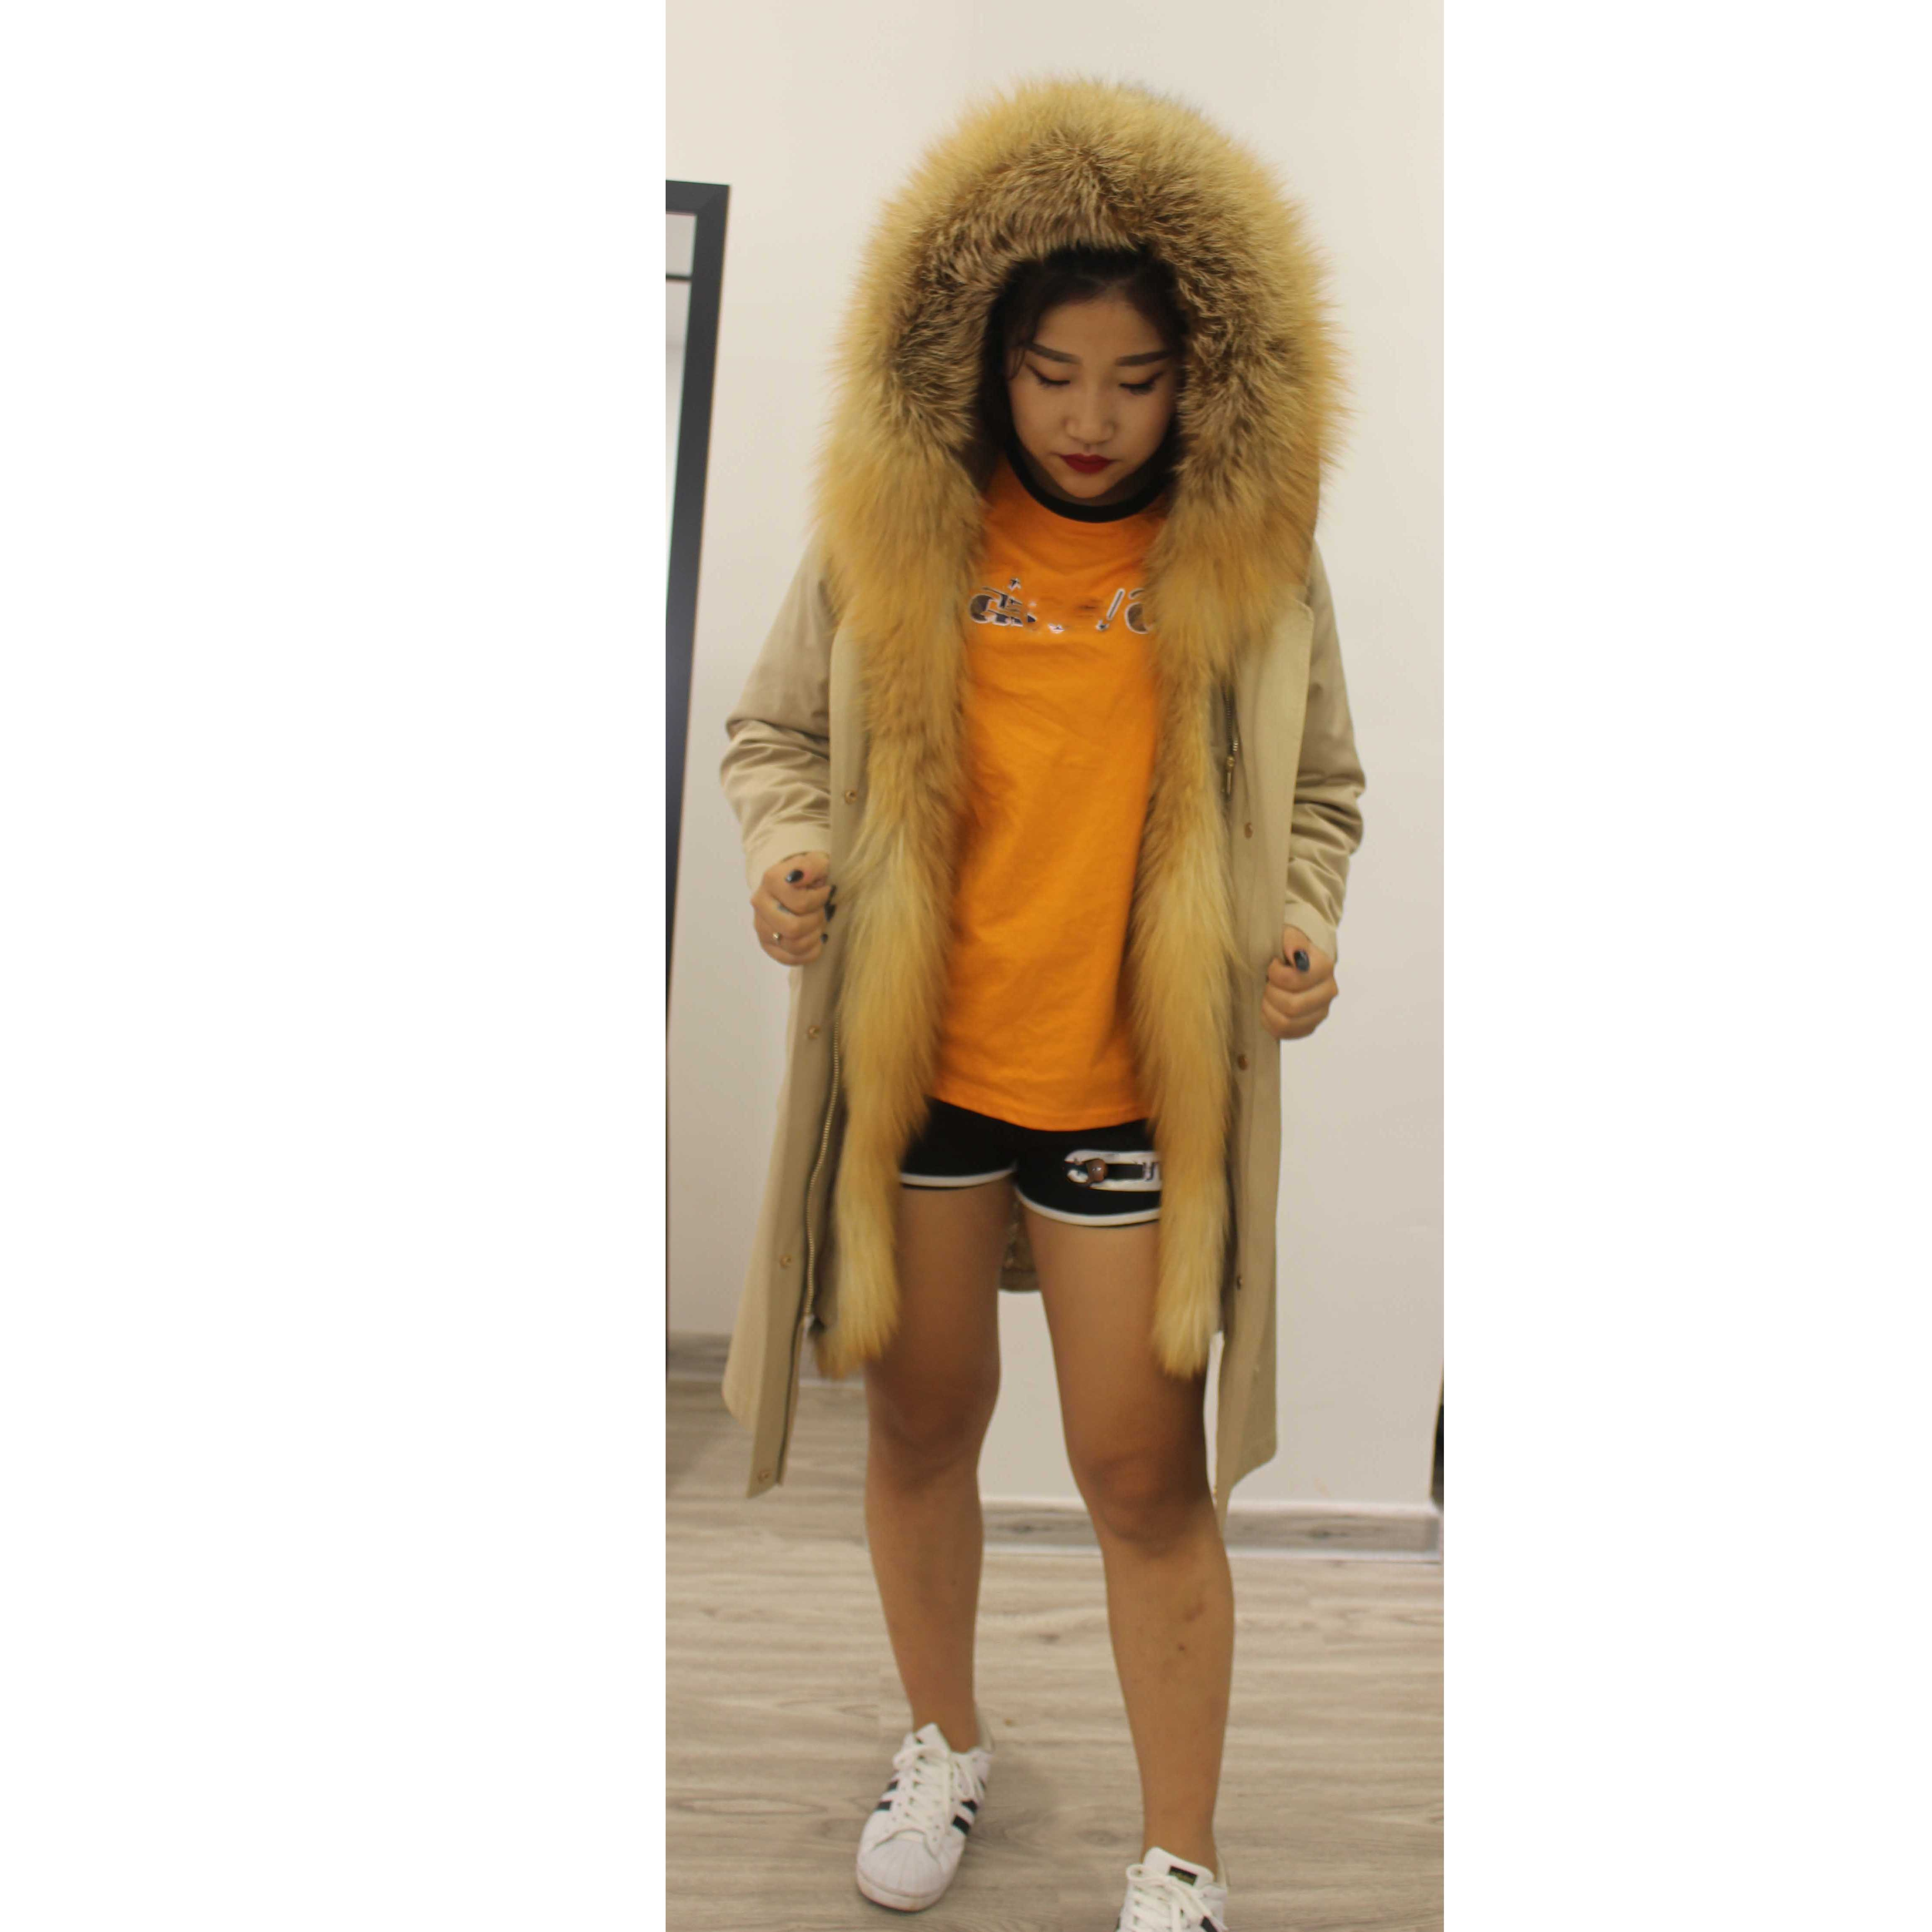 Linhaoshengyue-معطف فرو نسائي ، معطف فرو ثعلب حقيقي ، ياقة بغطاء للرأس ، معطف فرو أرنب بطول 90 سنتيمتر